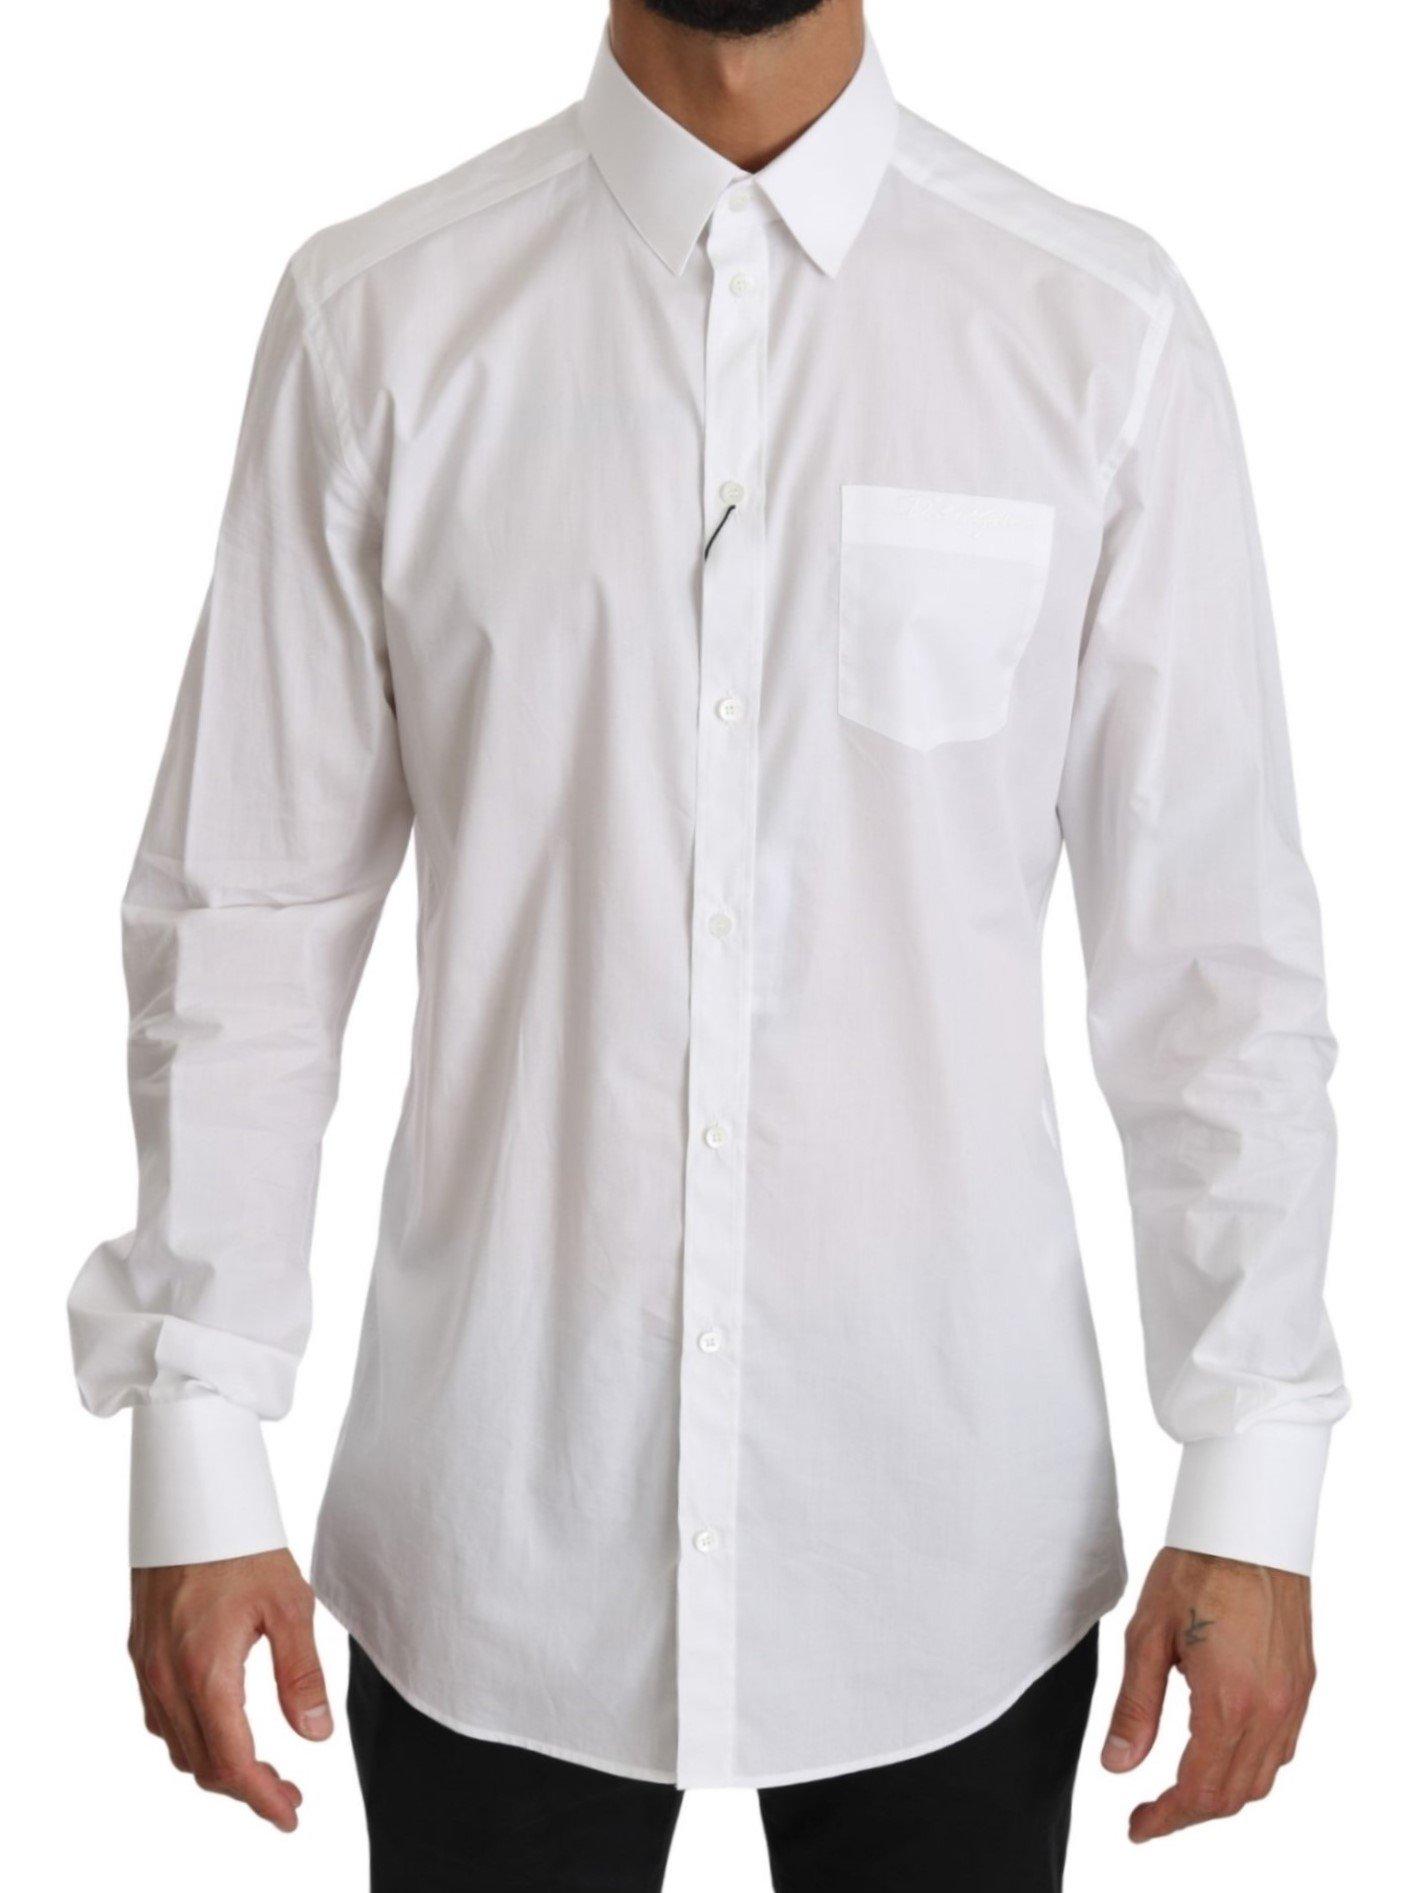 Dolce & Gabbana Men's LS Dress Formal Shirt White TSH4064 - IT41   L